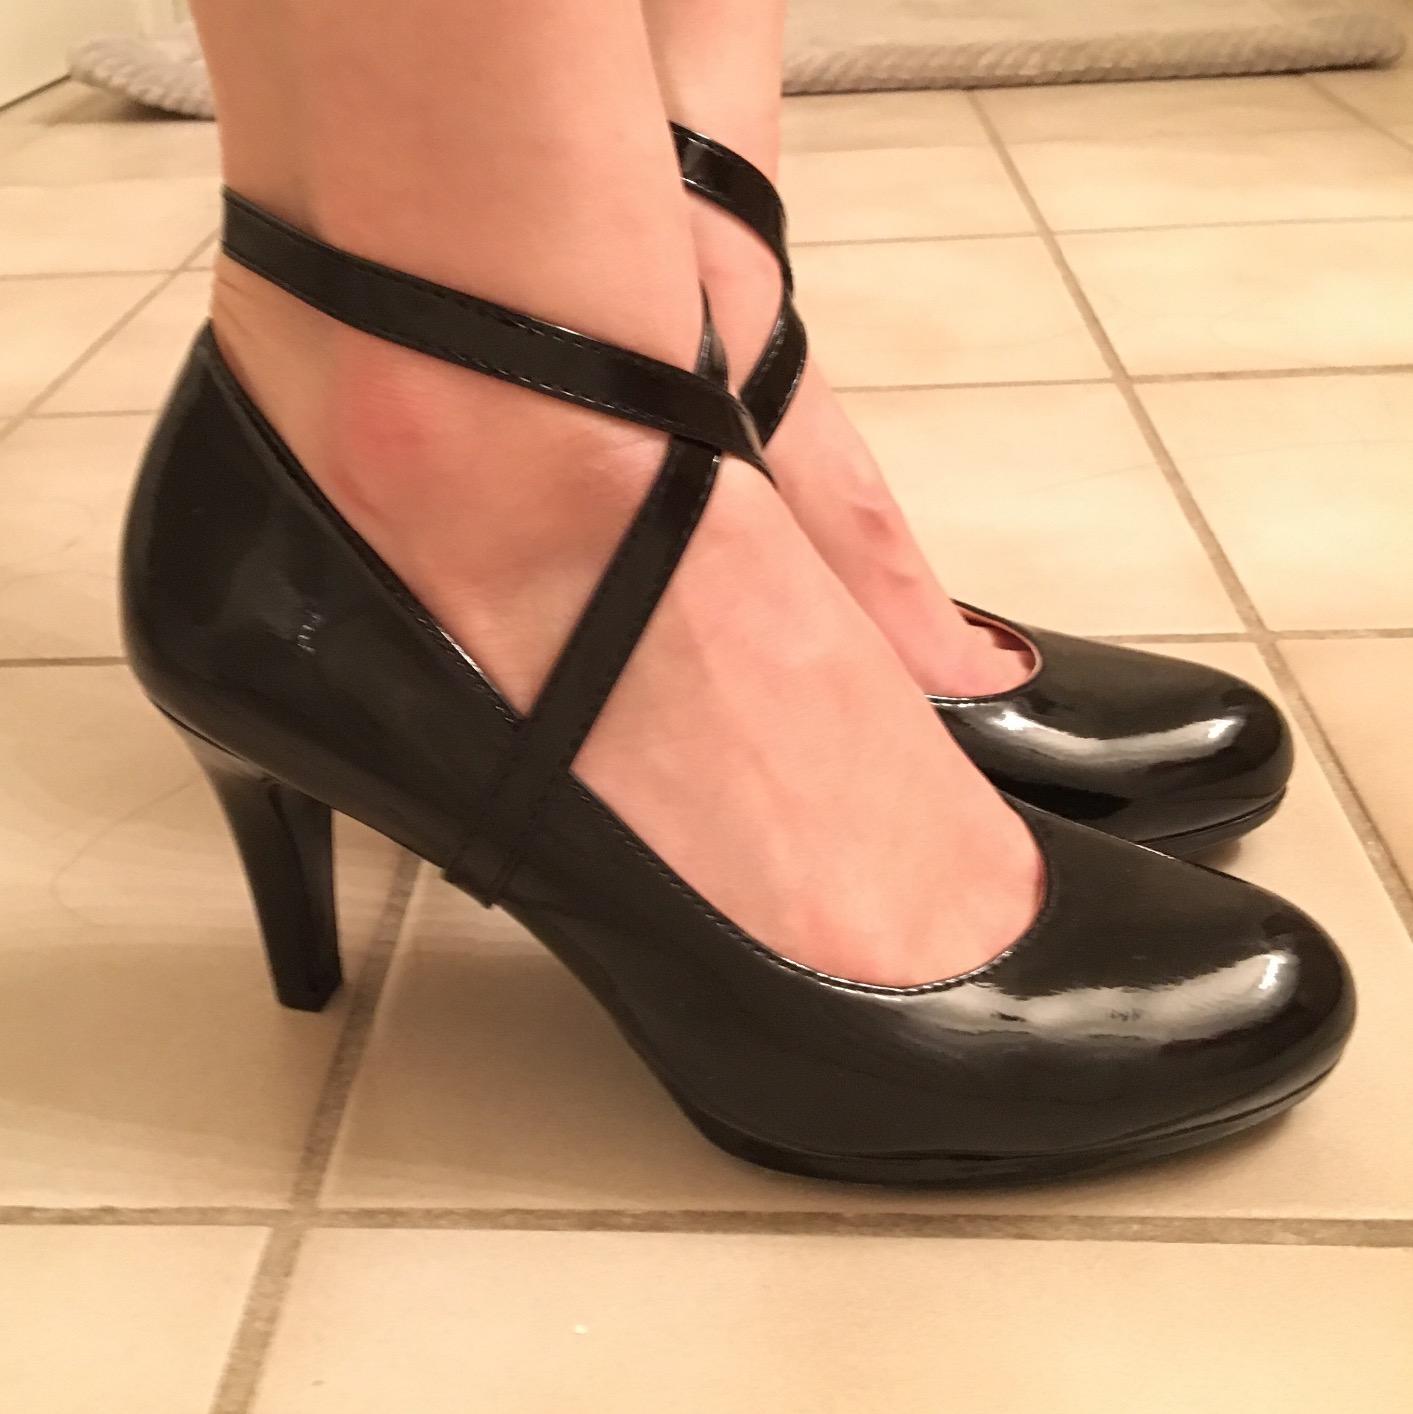 9ba1837bc8f Closecret Women s Detachable Anti-slip Anti-loose Shoe Laces for High  Heeled Shoes(